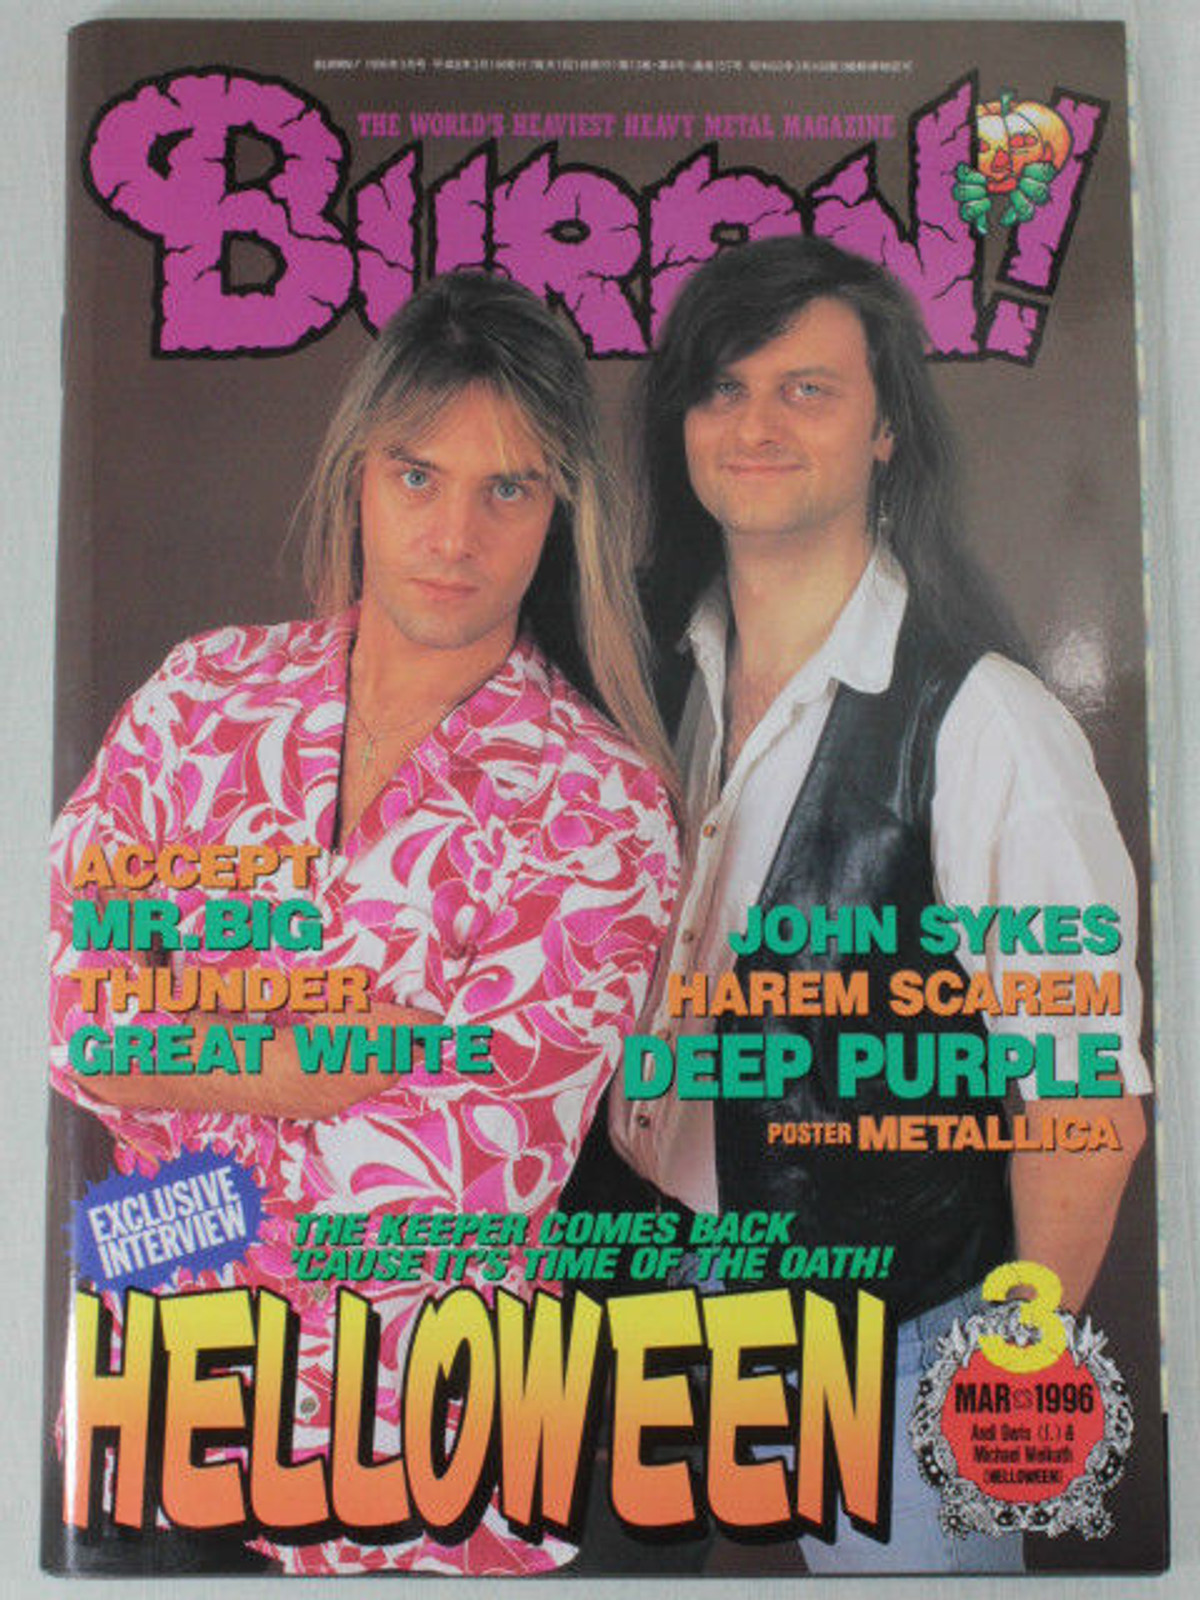 1996/03 BURRN! Japan Rock Magazine HELLOWEEN/ACCEPT/DEEP PURPLE/THUNDER/MR.BIG